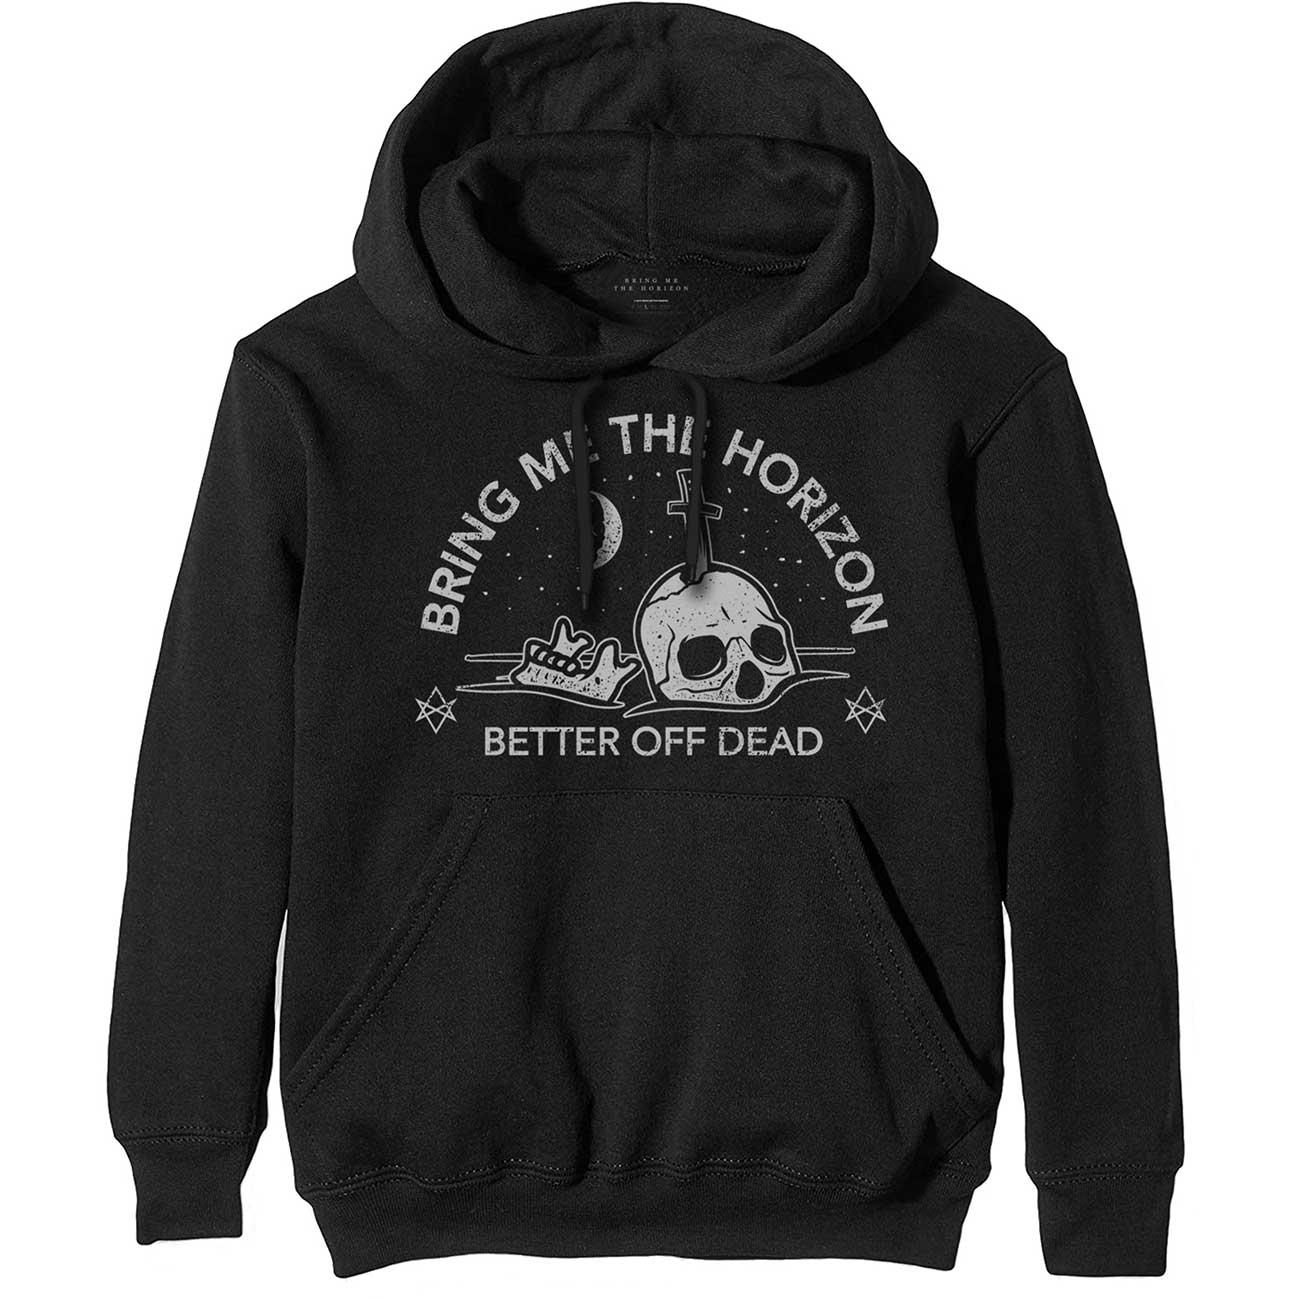 438d92cbd30c87 Bring Me The Horizon Happy Song Hoodie - PUNX.UK